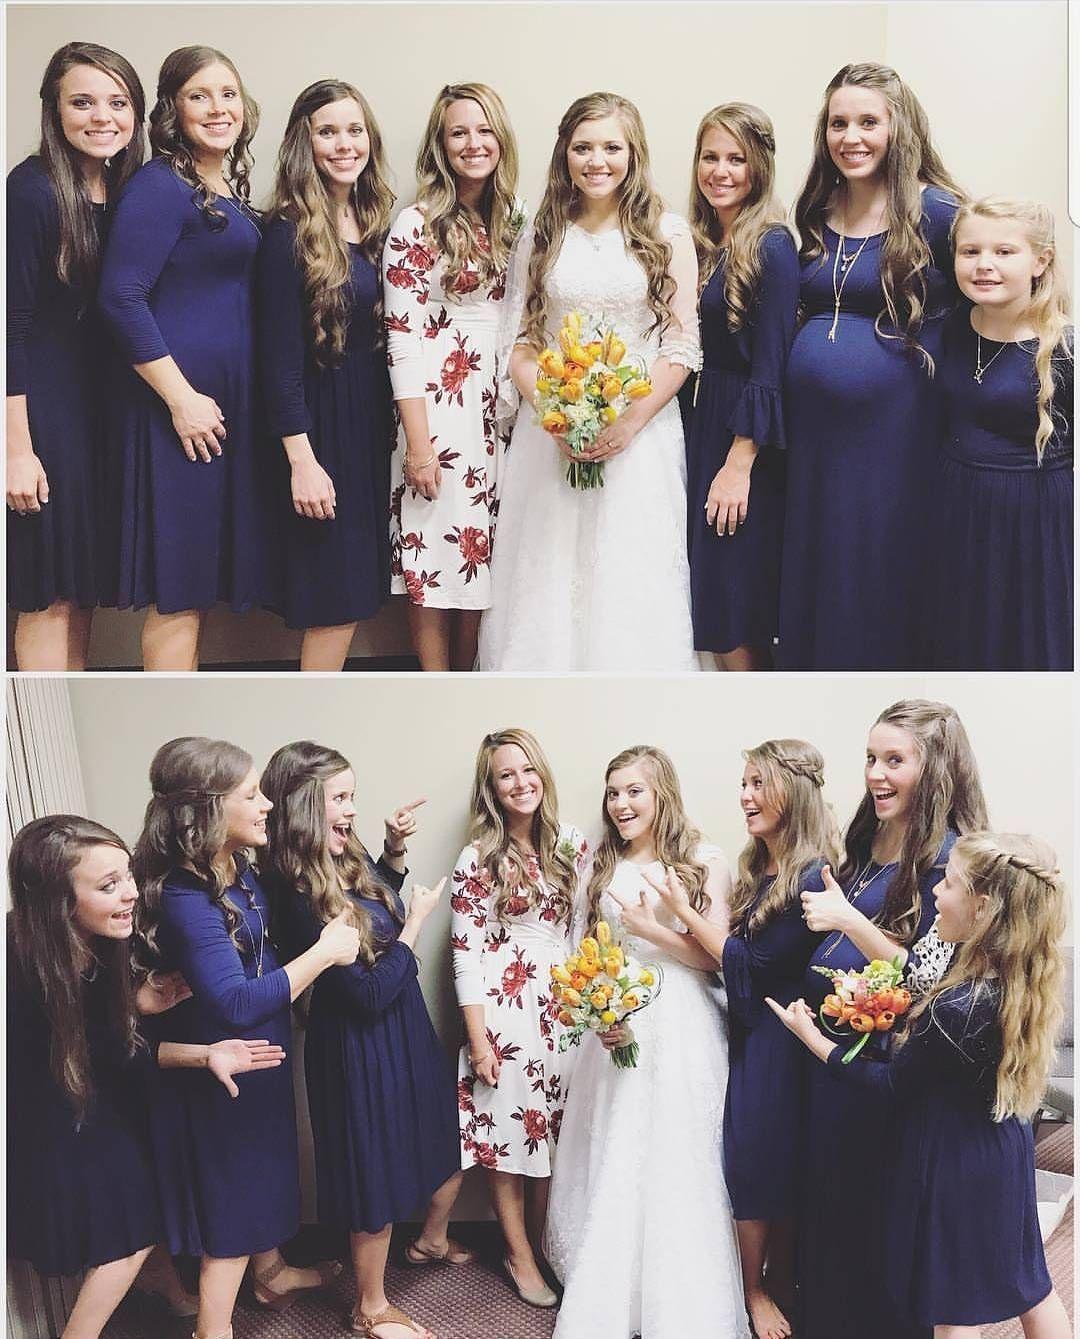 The Duggar Family On Instagram Fbf Some Bridesmaids At Joy Anna S Wedding And Laura Did Wonderful Work Of Wedding Coordi Duggars Duggar Girls Duggar Wedding